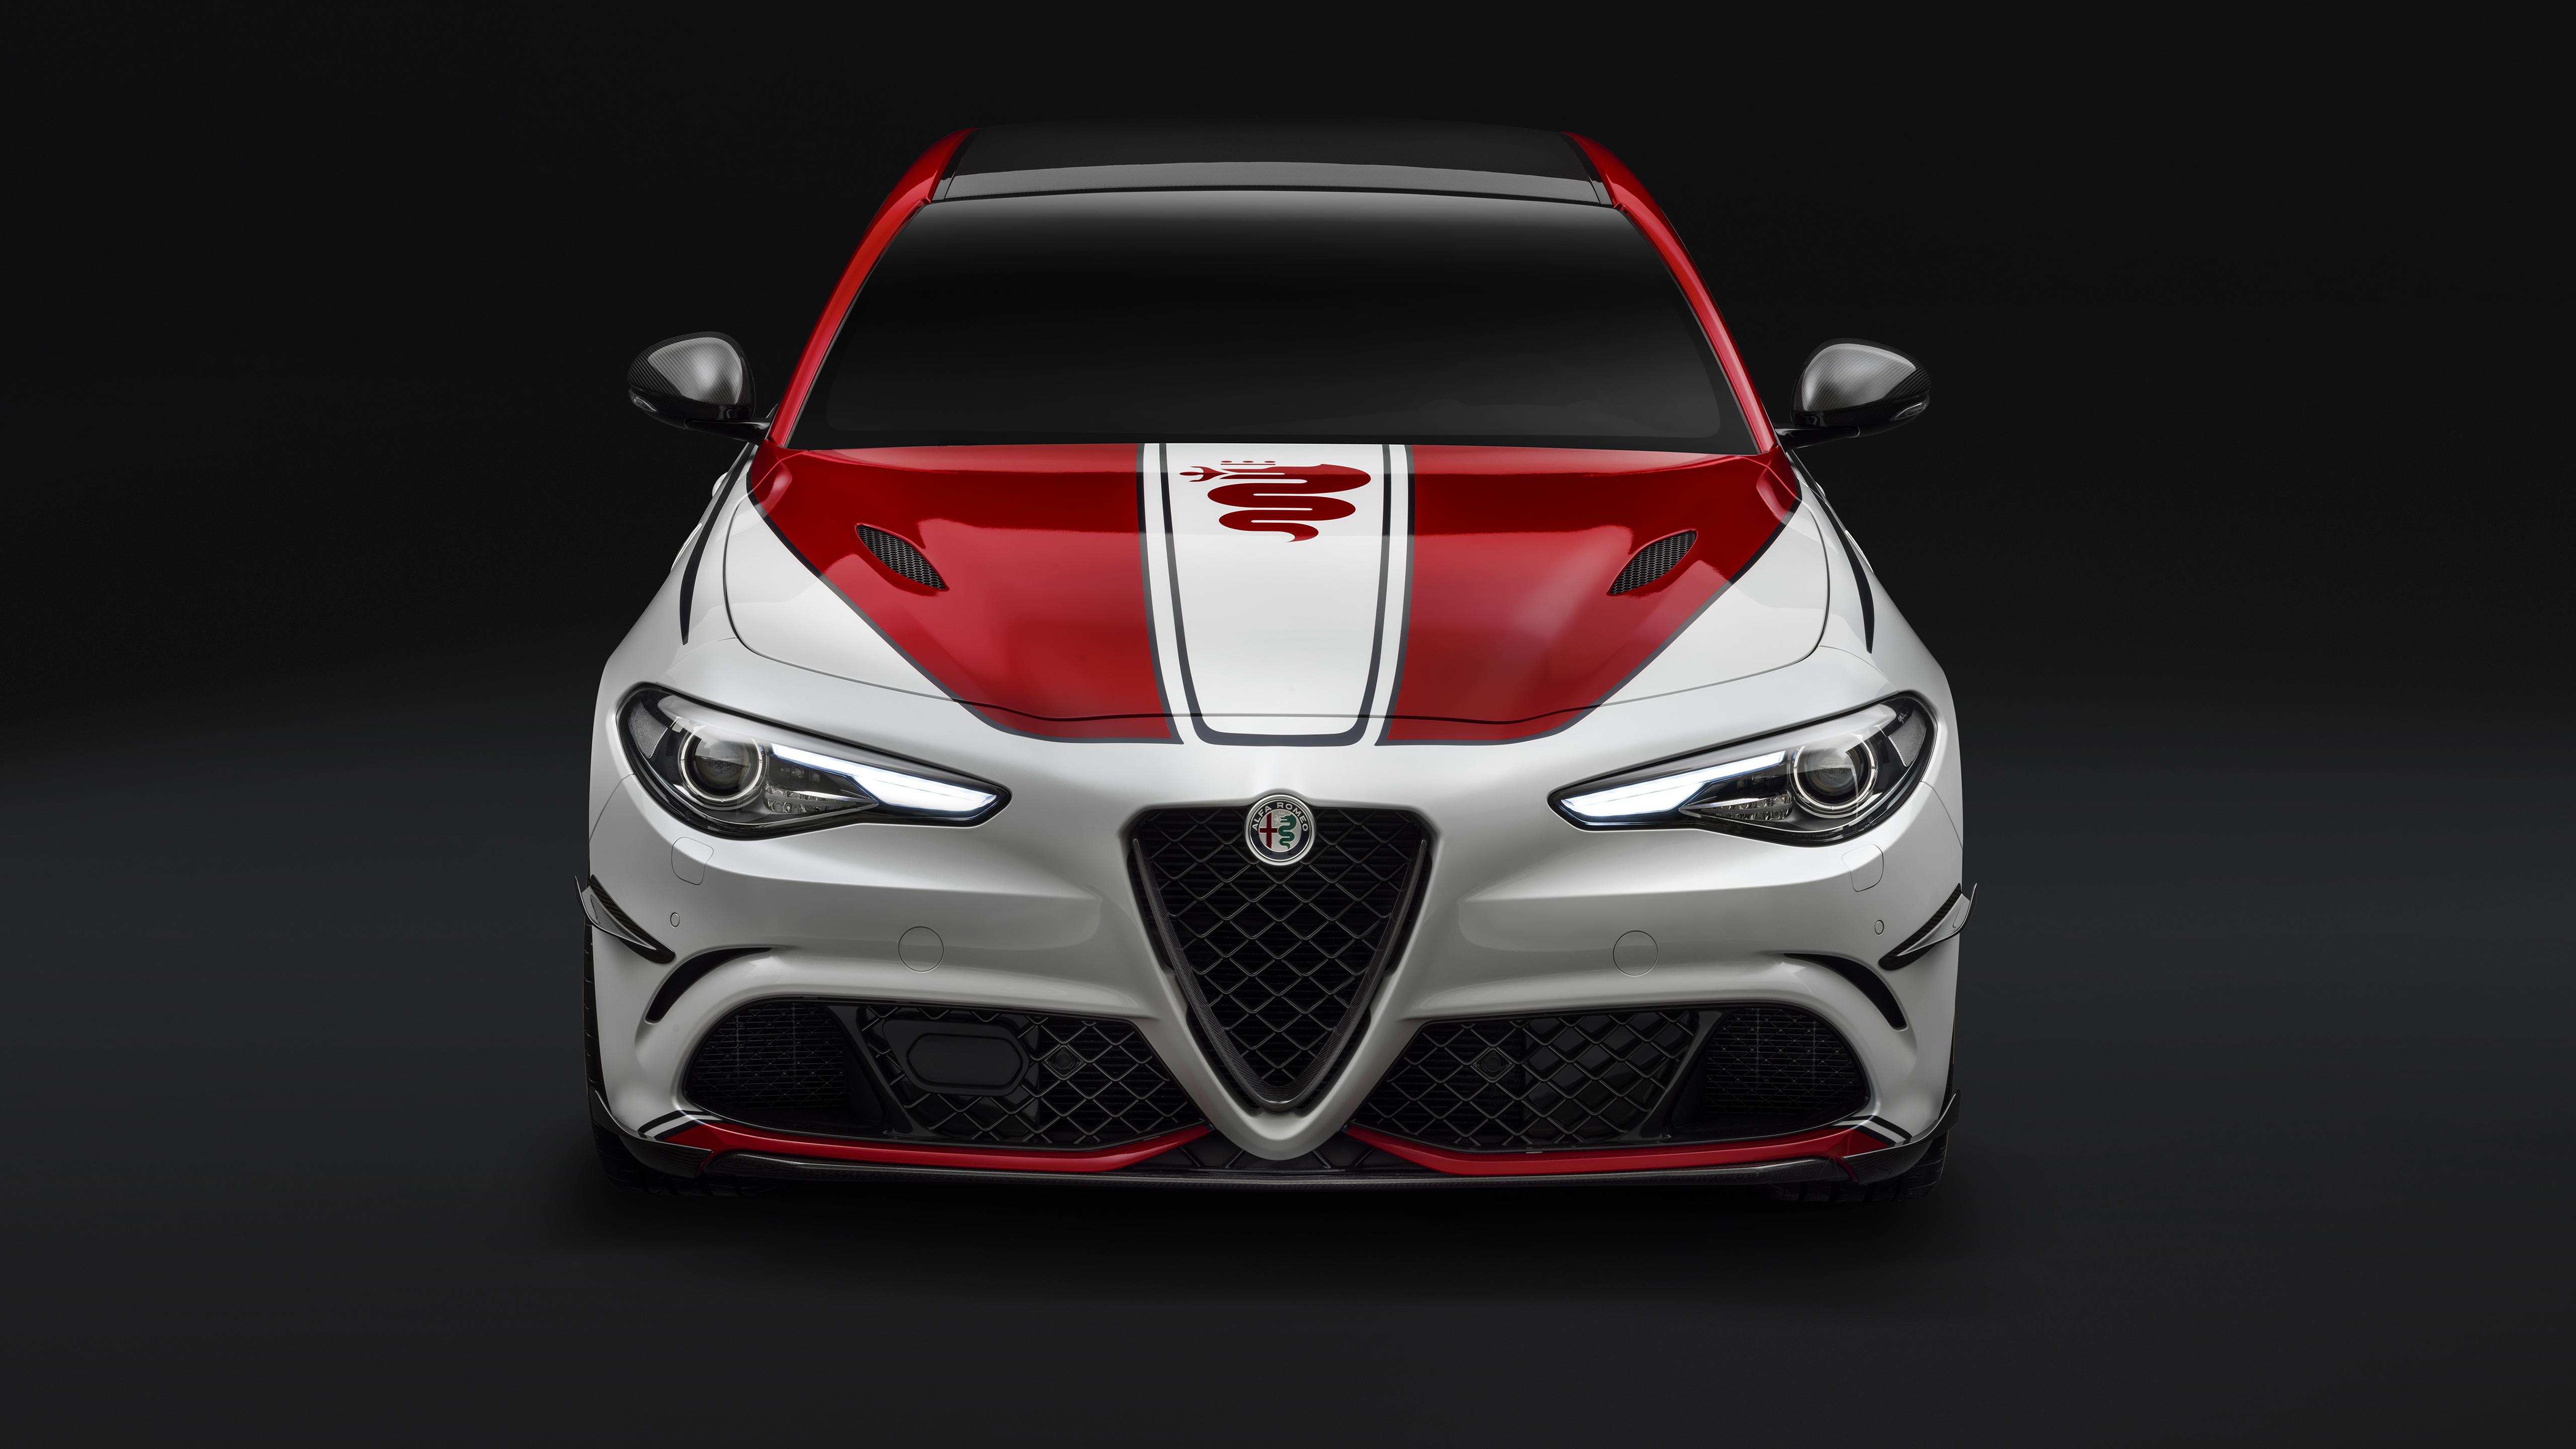 Alfa Romeo Giulia Quadrifoglio Alfa Romeo Racing 2019 4k Wallpaper